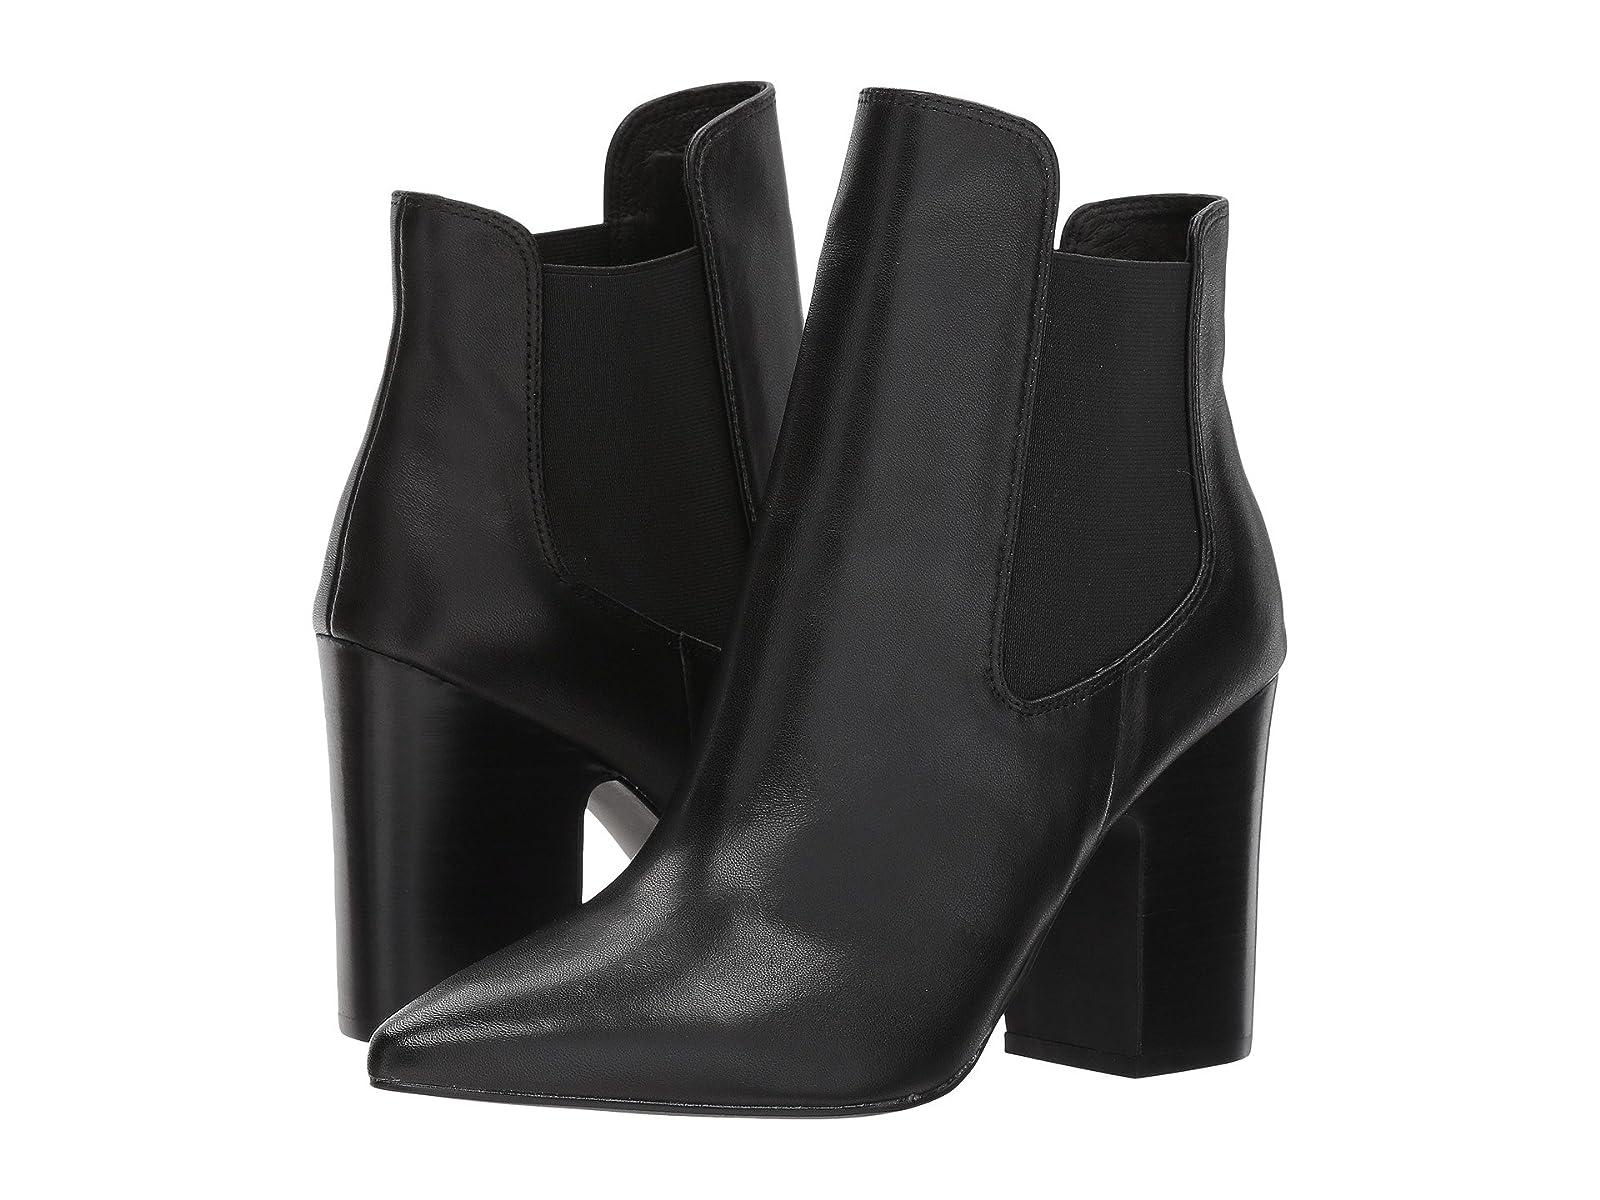 Kristin Cavallari Starlight BootieAffordable and distinctive shoes